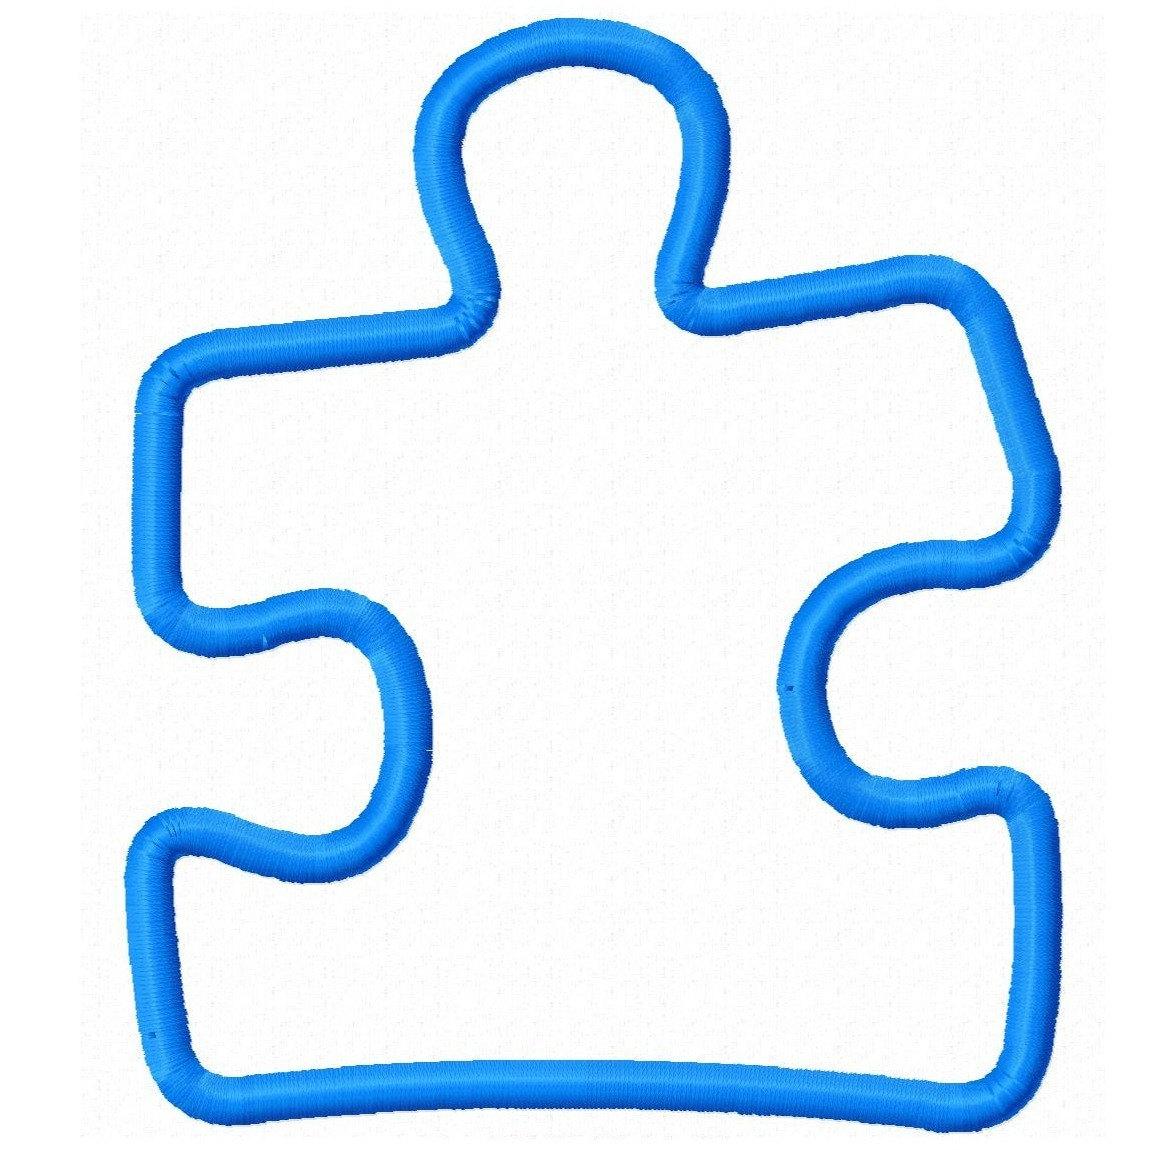 Puzzle Pieces Outline | Free Download Best Puzzle Pieces Outline On - Free Printable Autism Puzzle Piece